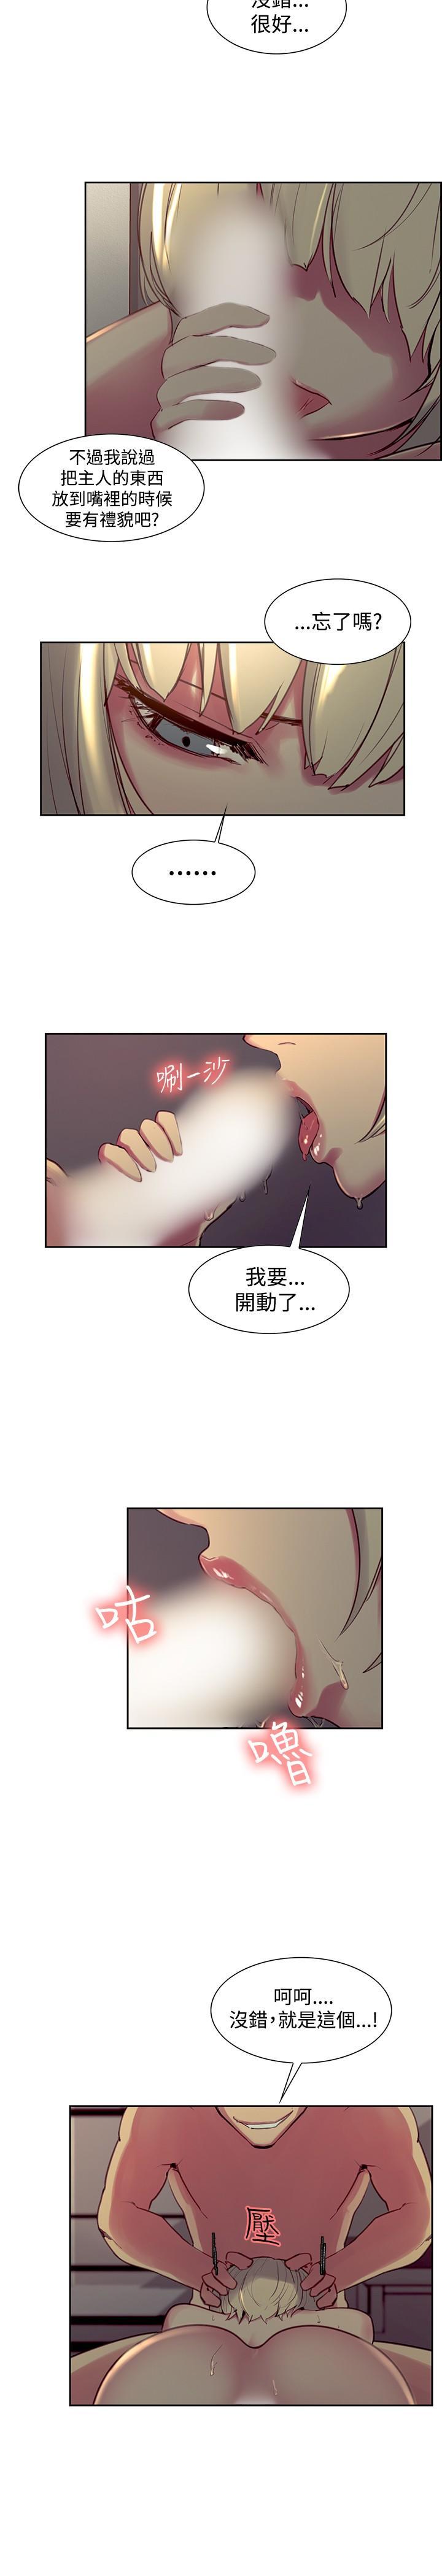 Domesticate the Housekeeper 调教家政妇 ch.29-32 8